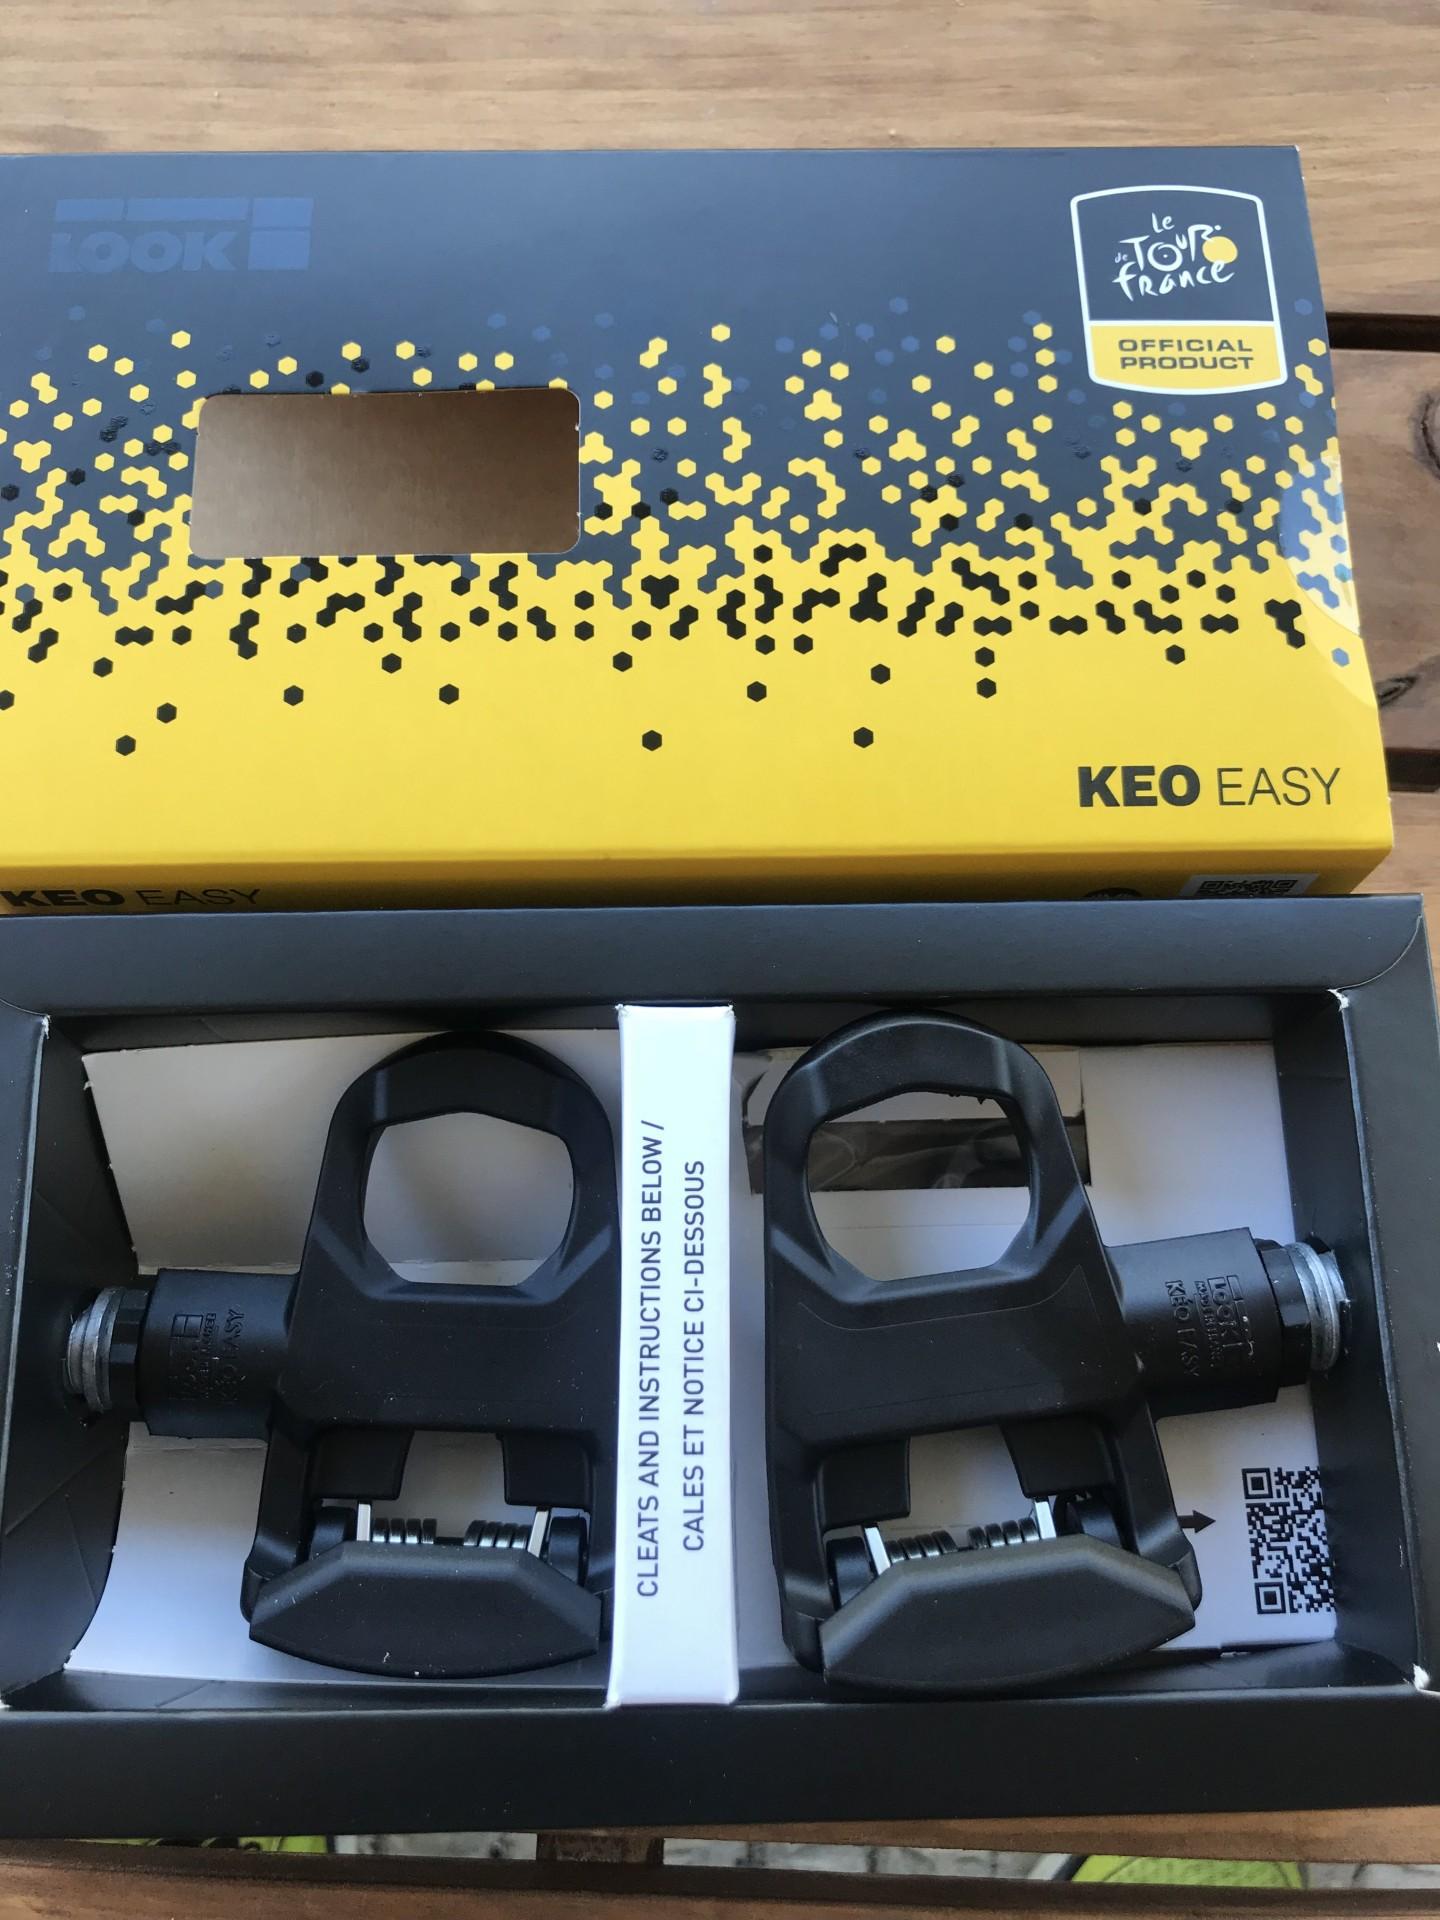 Pedais Look Keo Easy - Tour de France